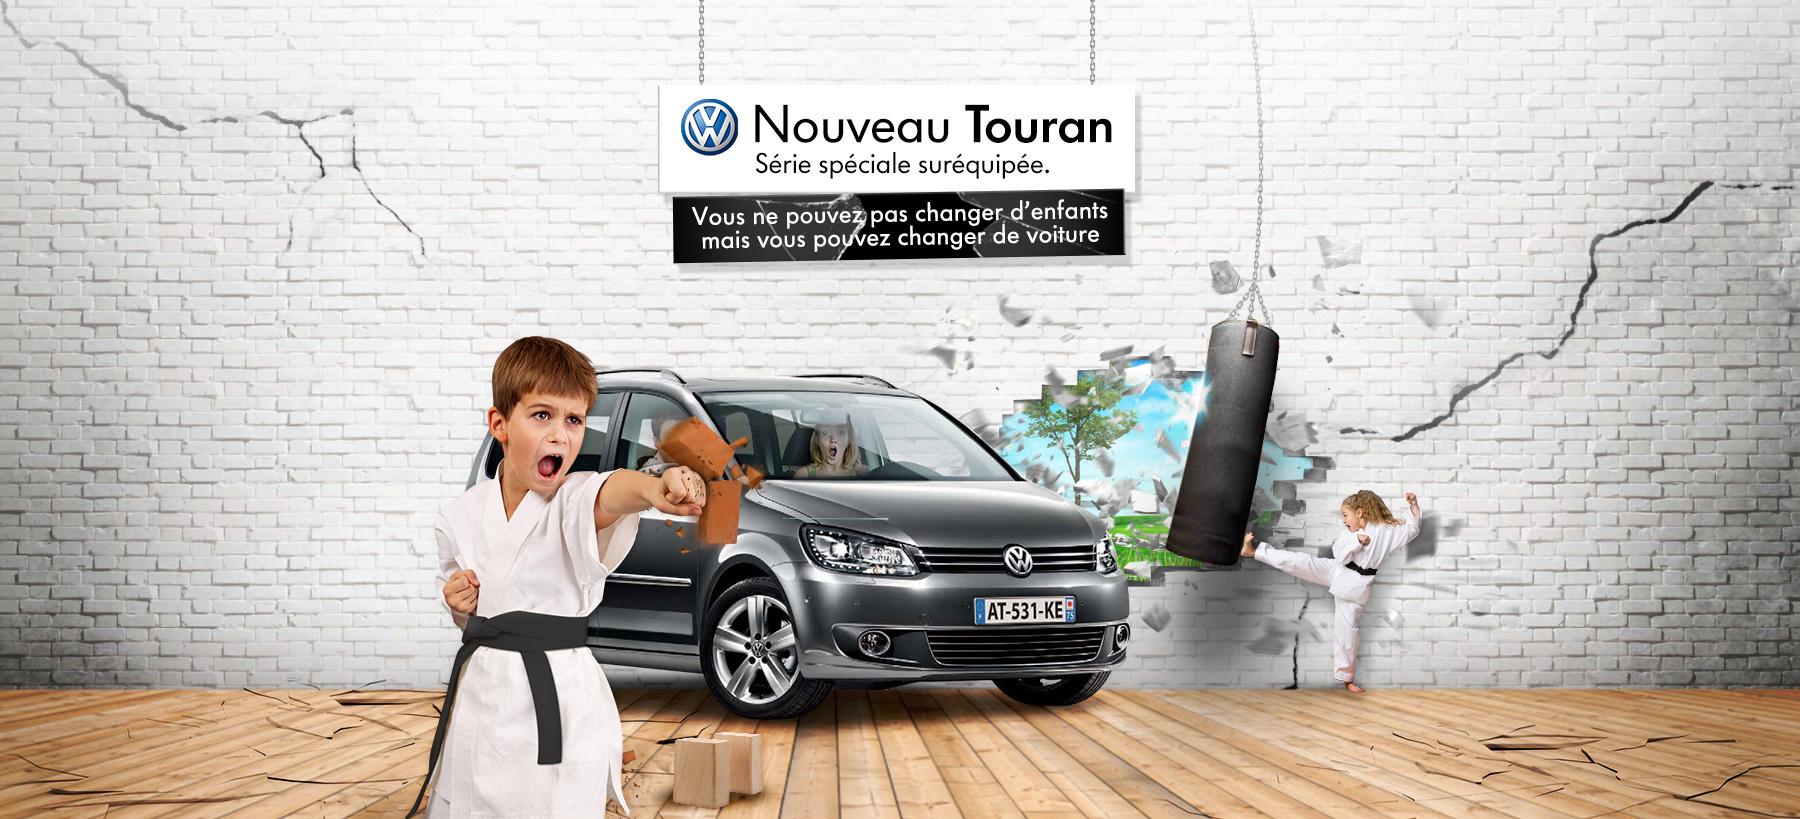 Directeur artistique freelance Portfolio Paris - Volkswagen Touran